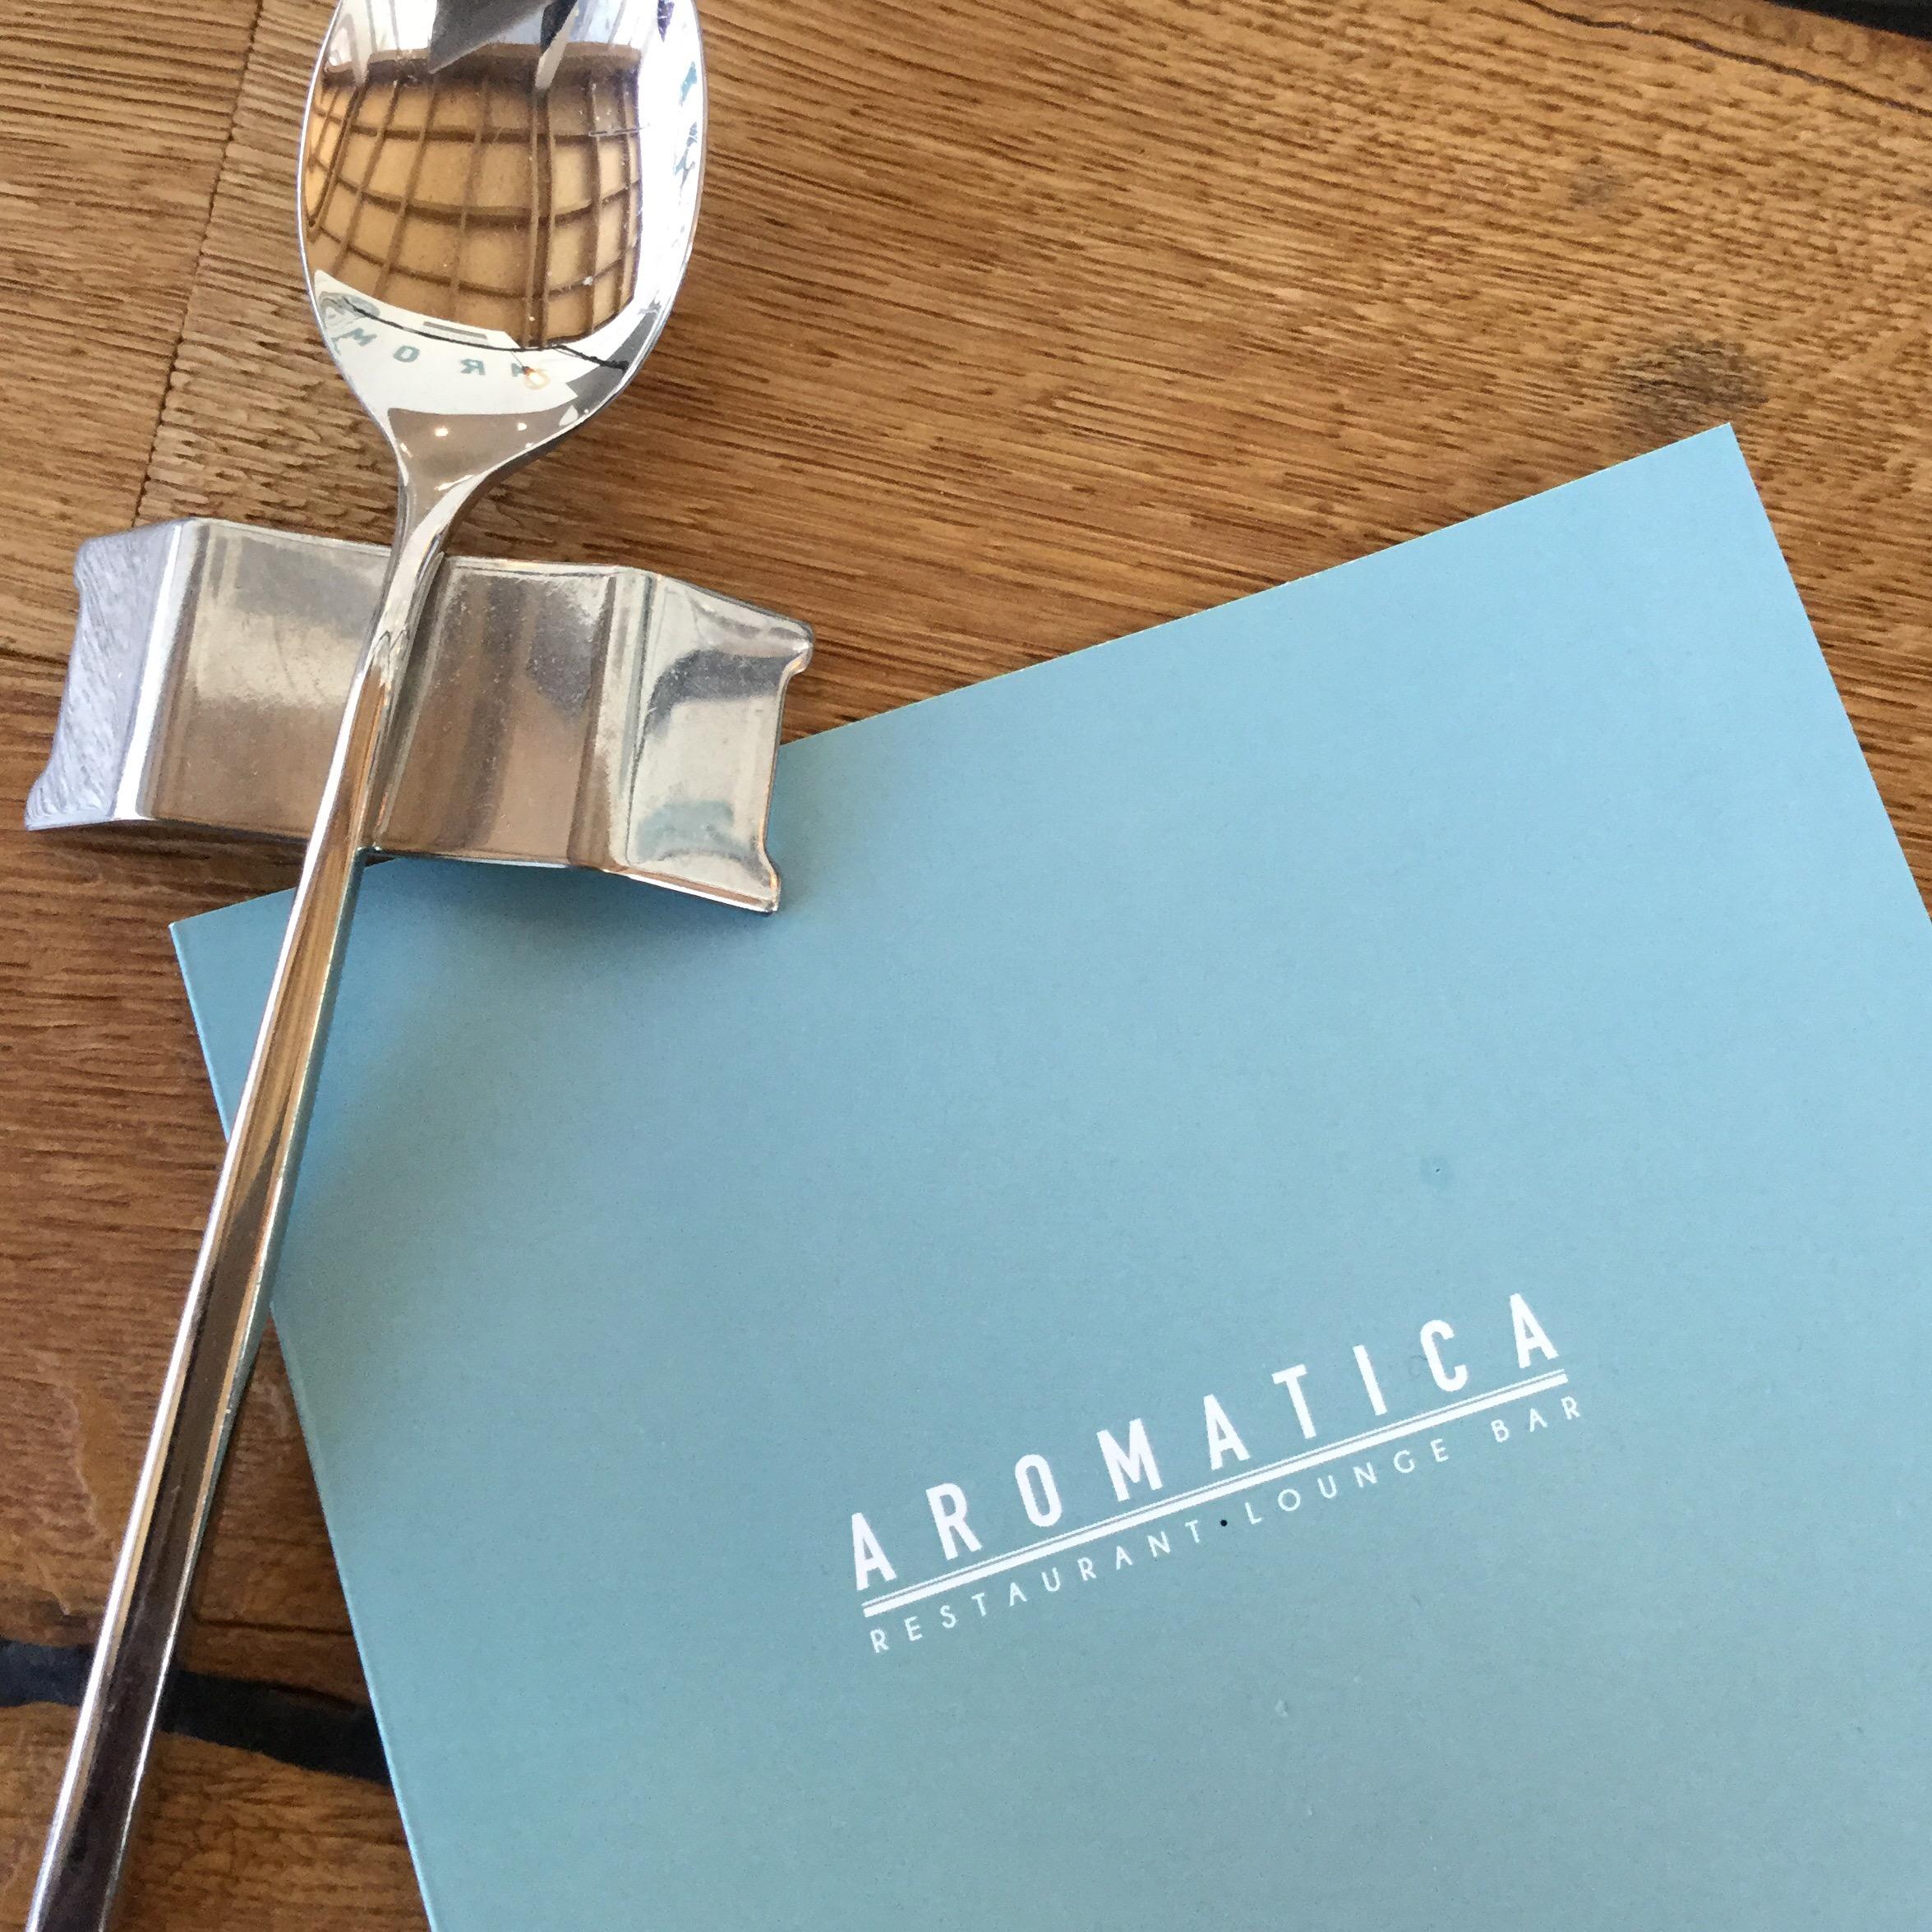 Aromatica Restaurant Lounge Bar diversamente gourmet